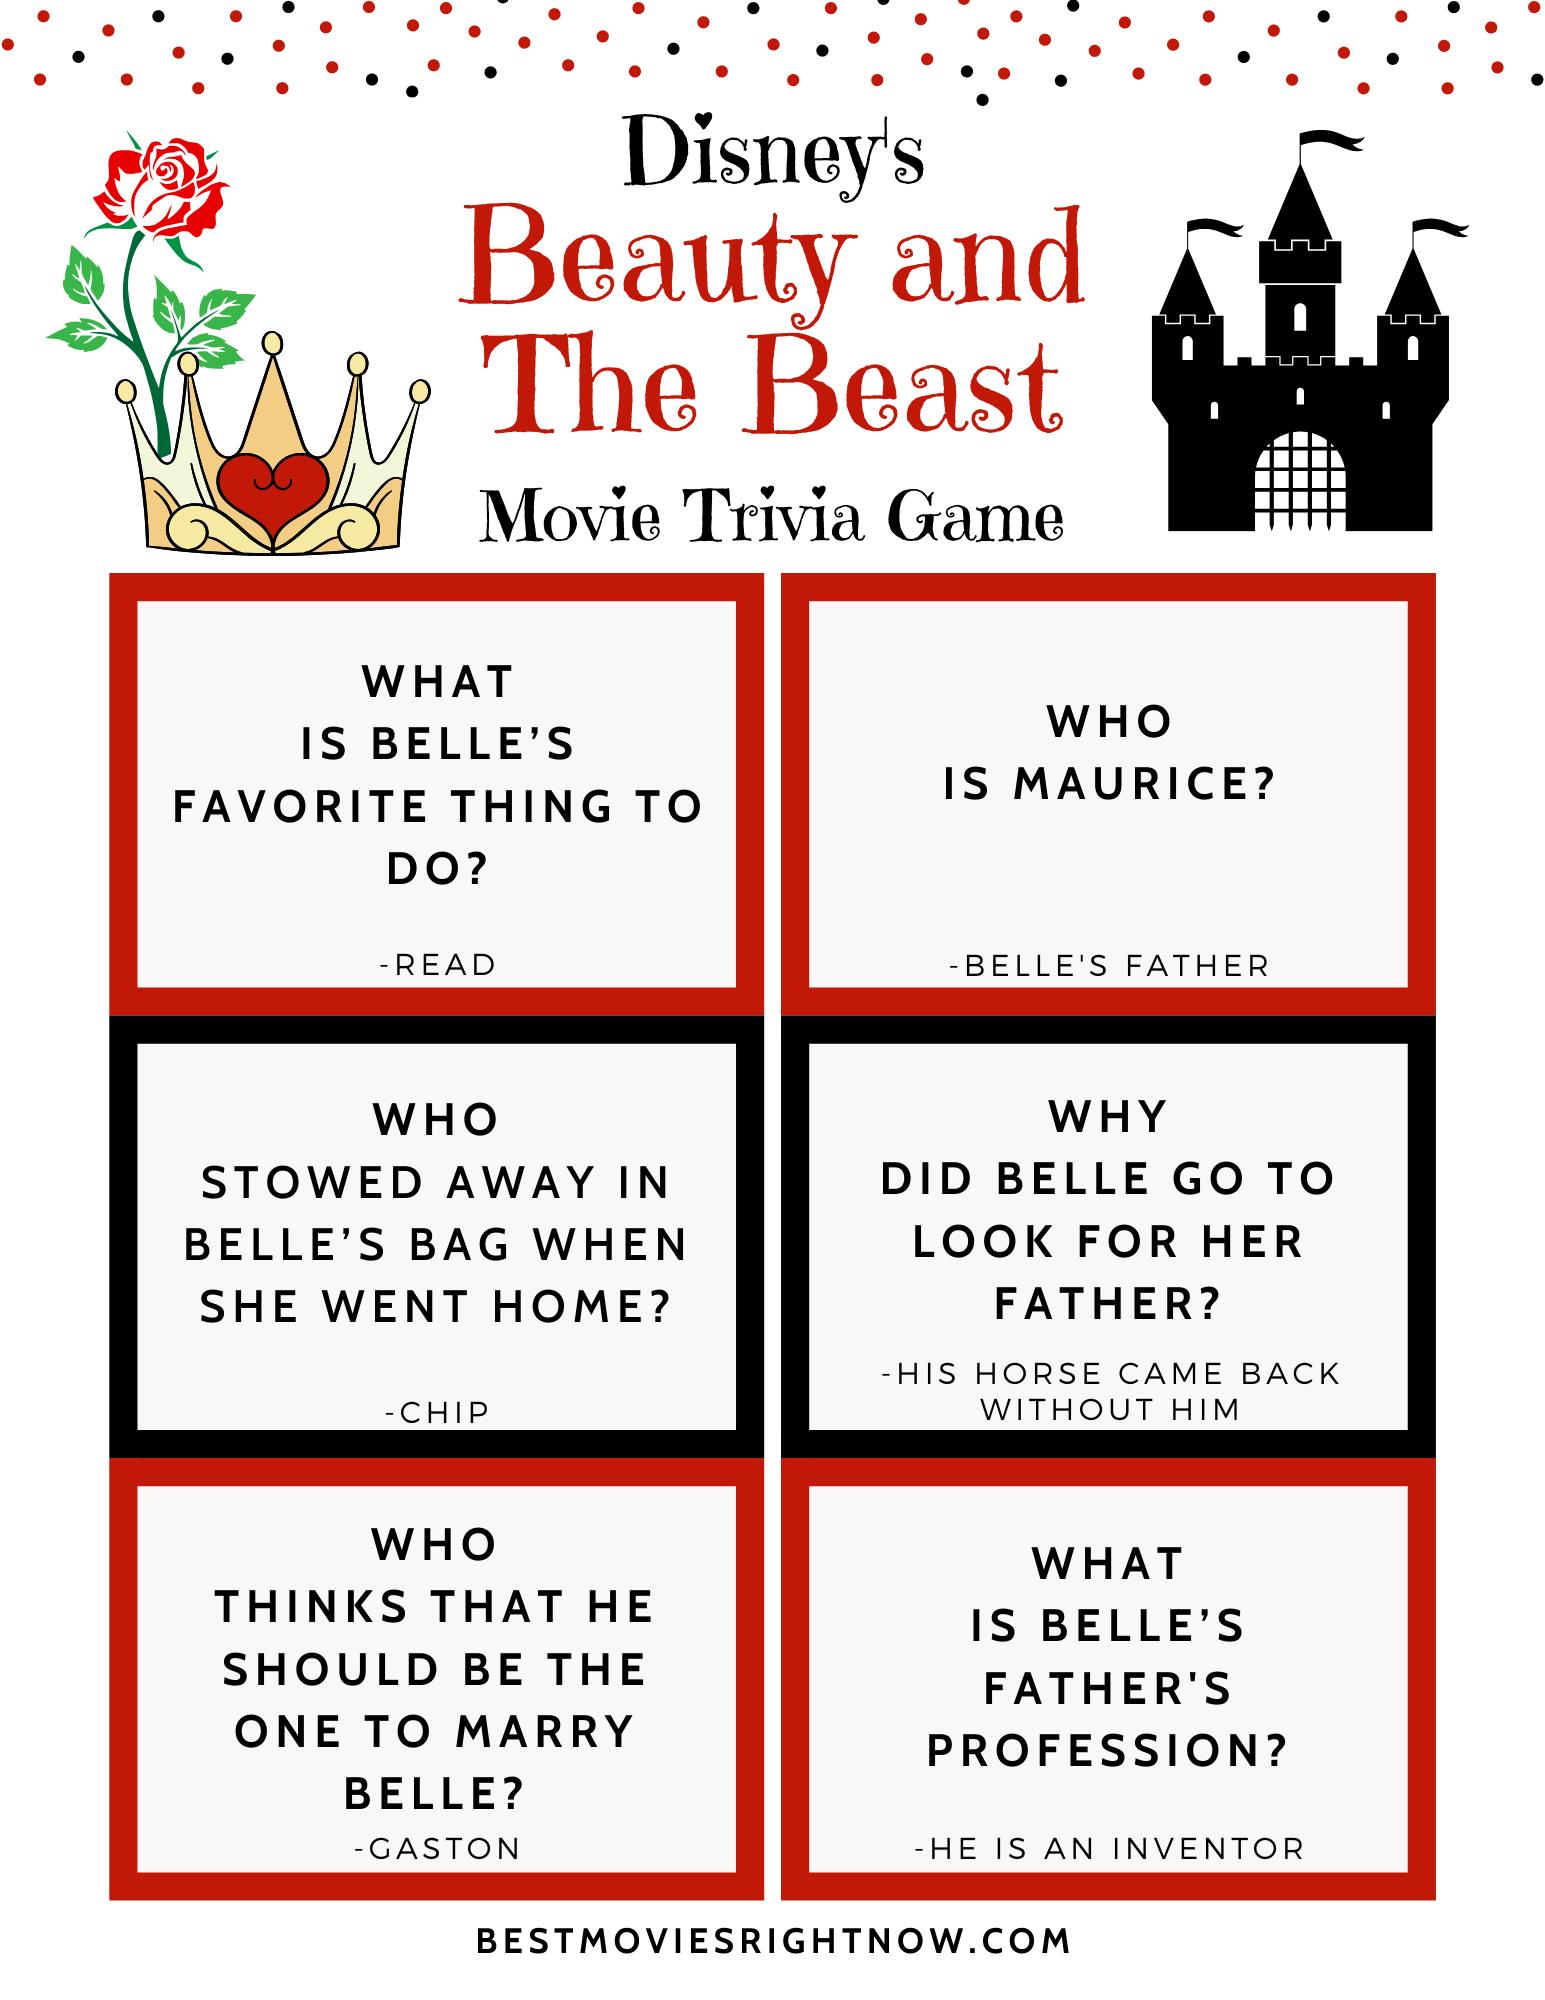 Disney Trivia - Beauty and the Beast